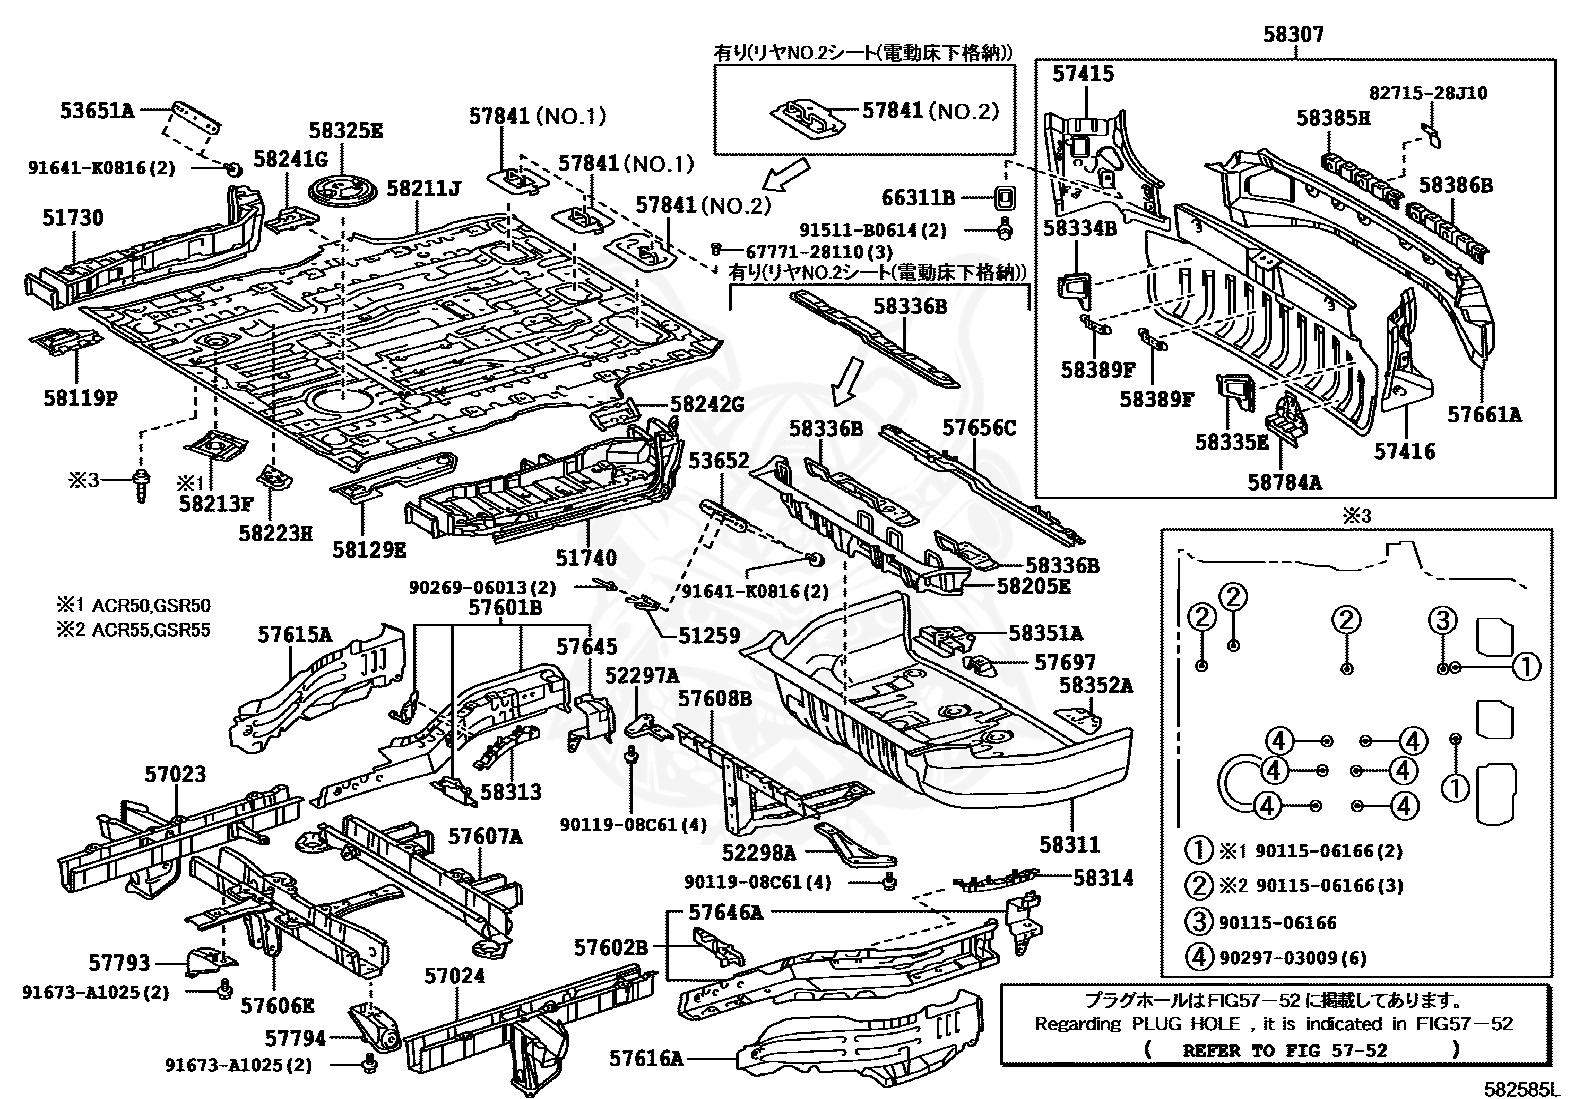 toyota previa transmission diagram 90269 06013 toyota rivet nengun performance  90269 06013 toyota rivet nengun